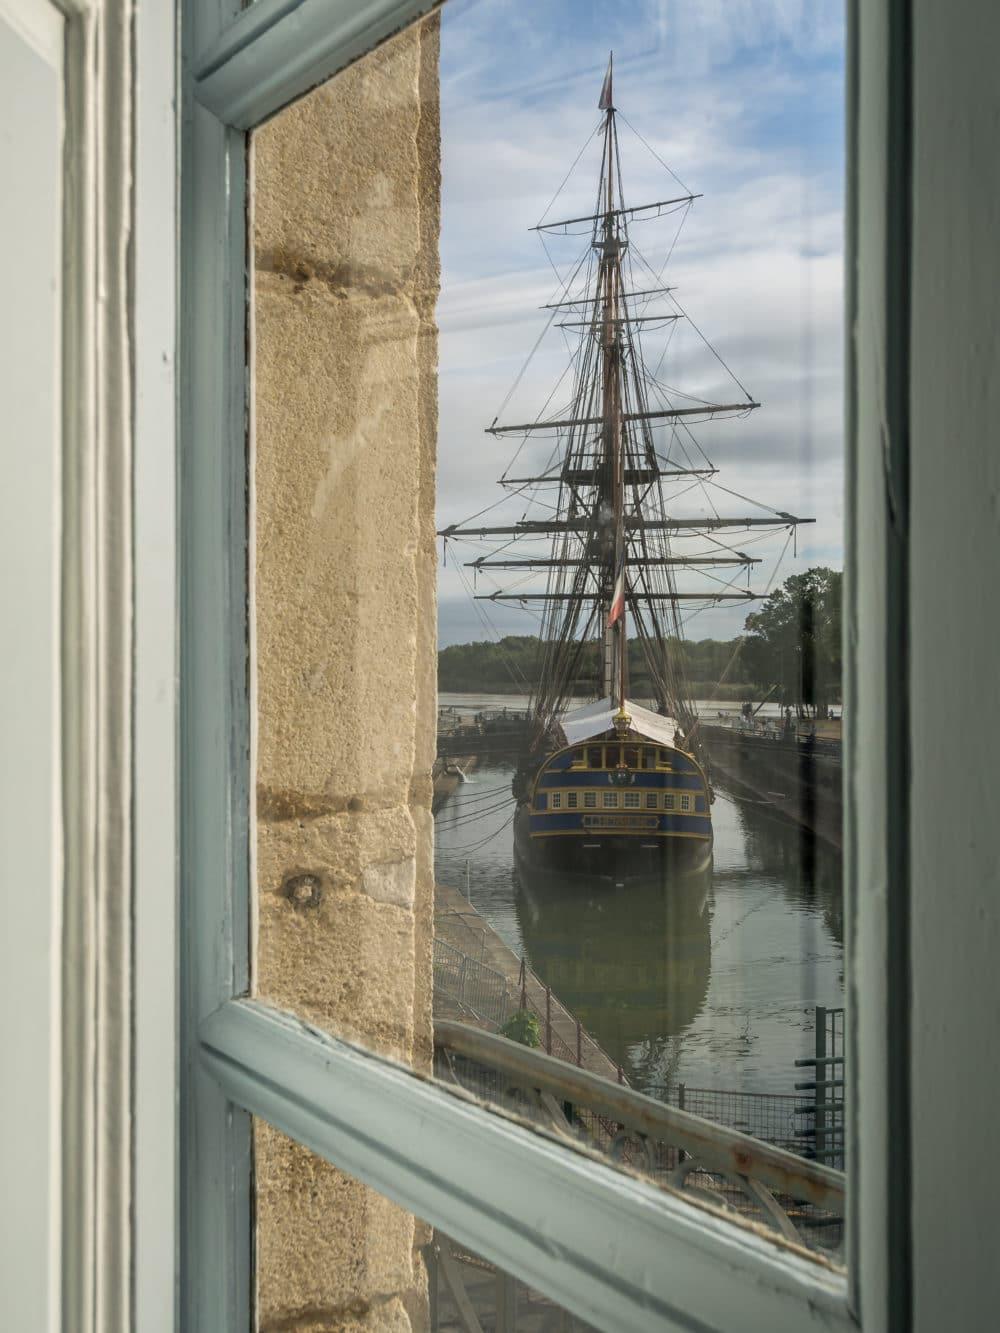 Musée de la marine Rochefort L'Hermione